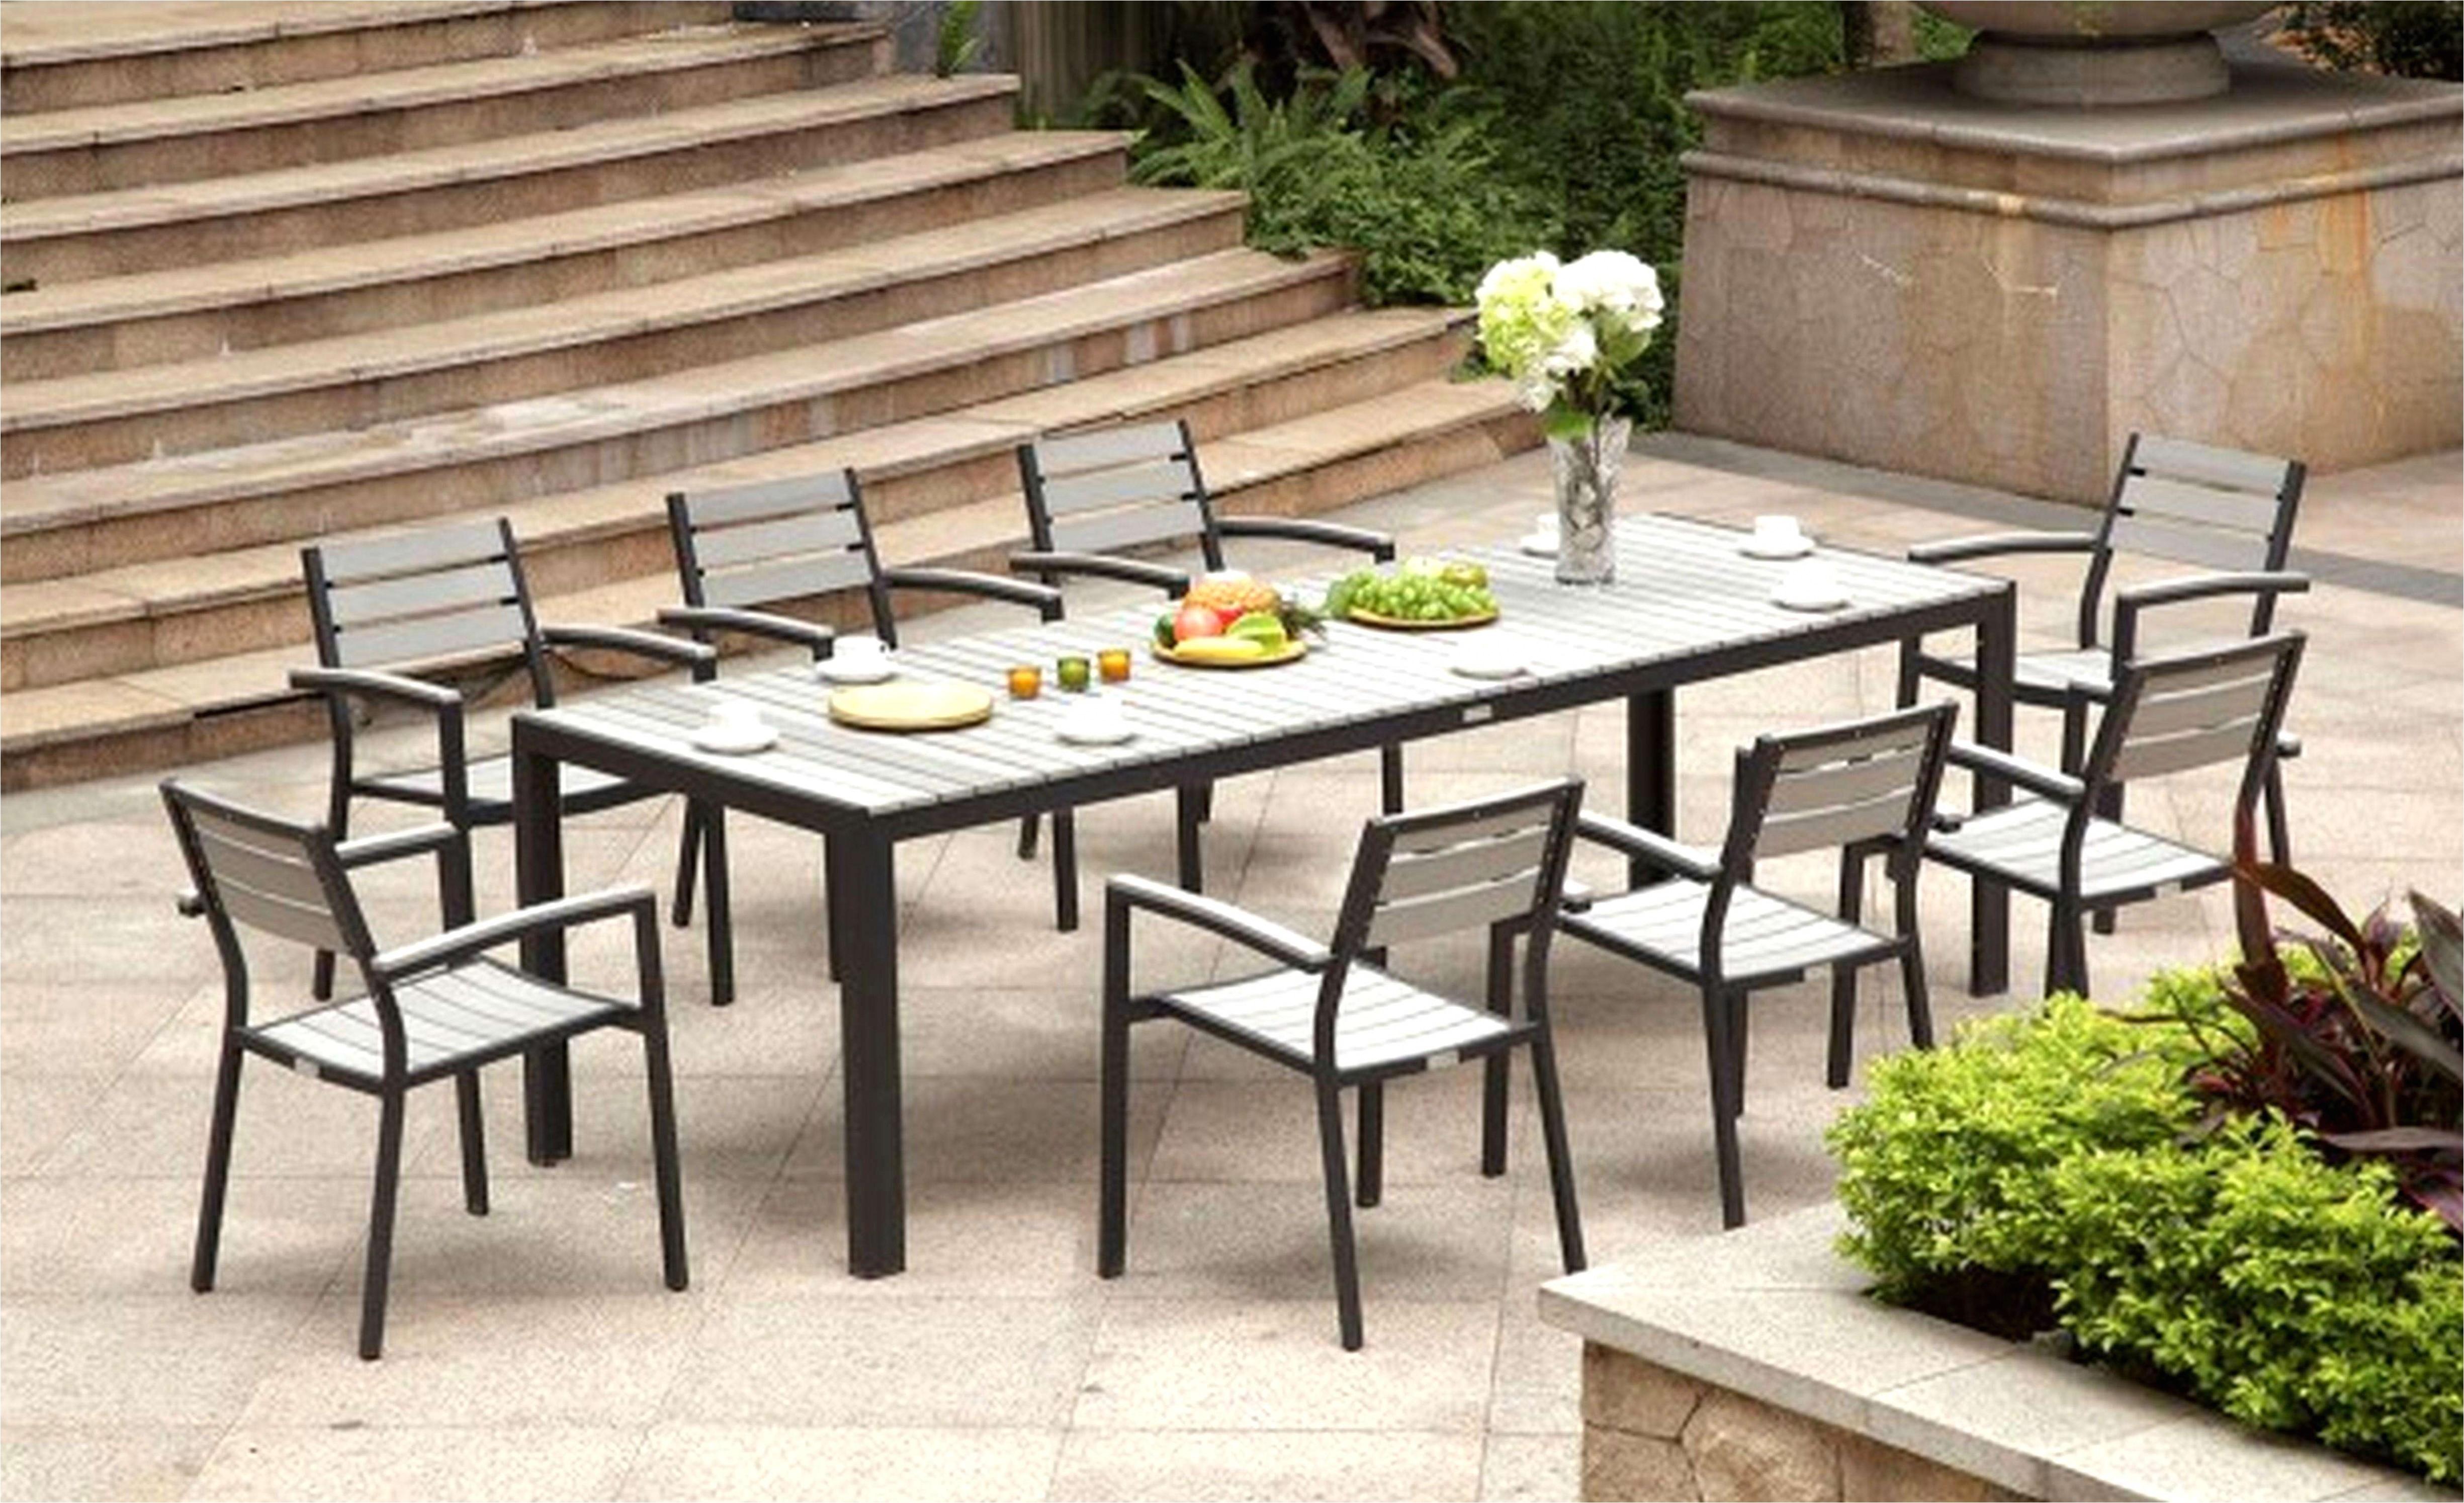 Furniture Stores In Lancaster Pa Outdoor Foothillfolk Designs